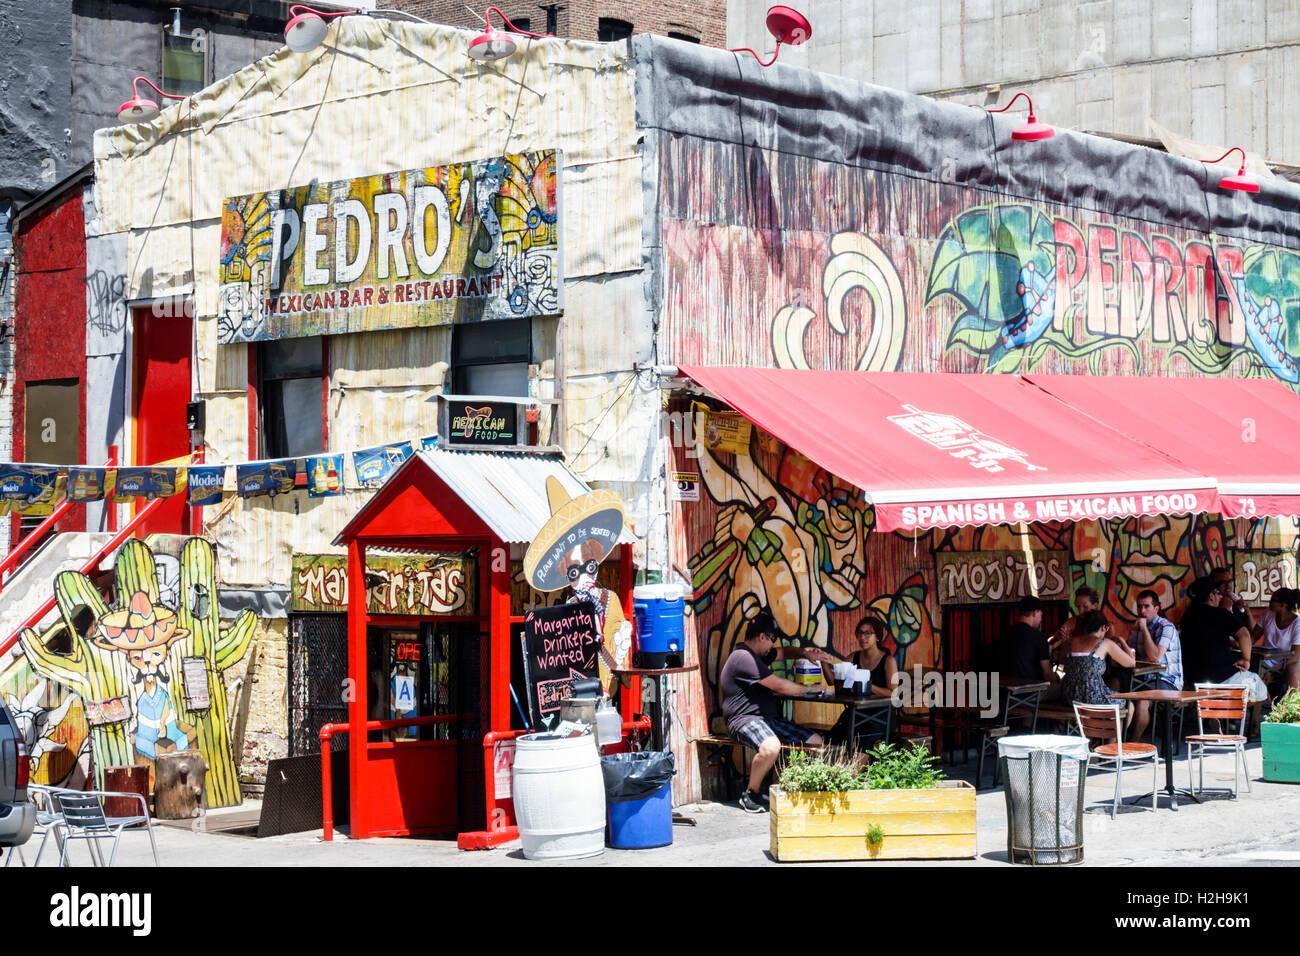 Brooklyn New York City NYC NY Dumbo Front Street Pedros Mexican Bar Und  Restaurant Außen Graffiti